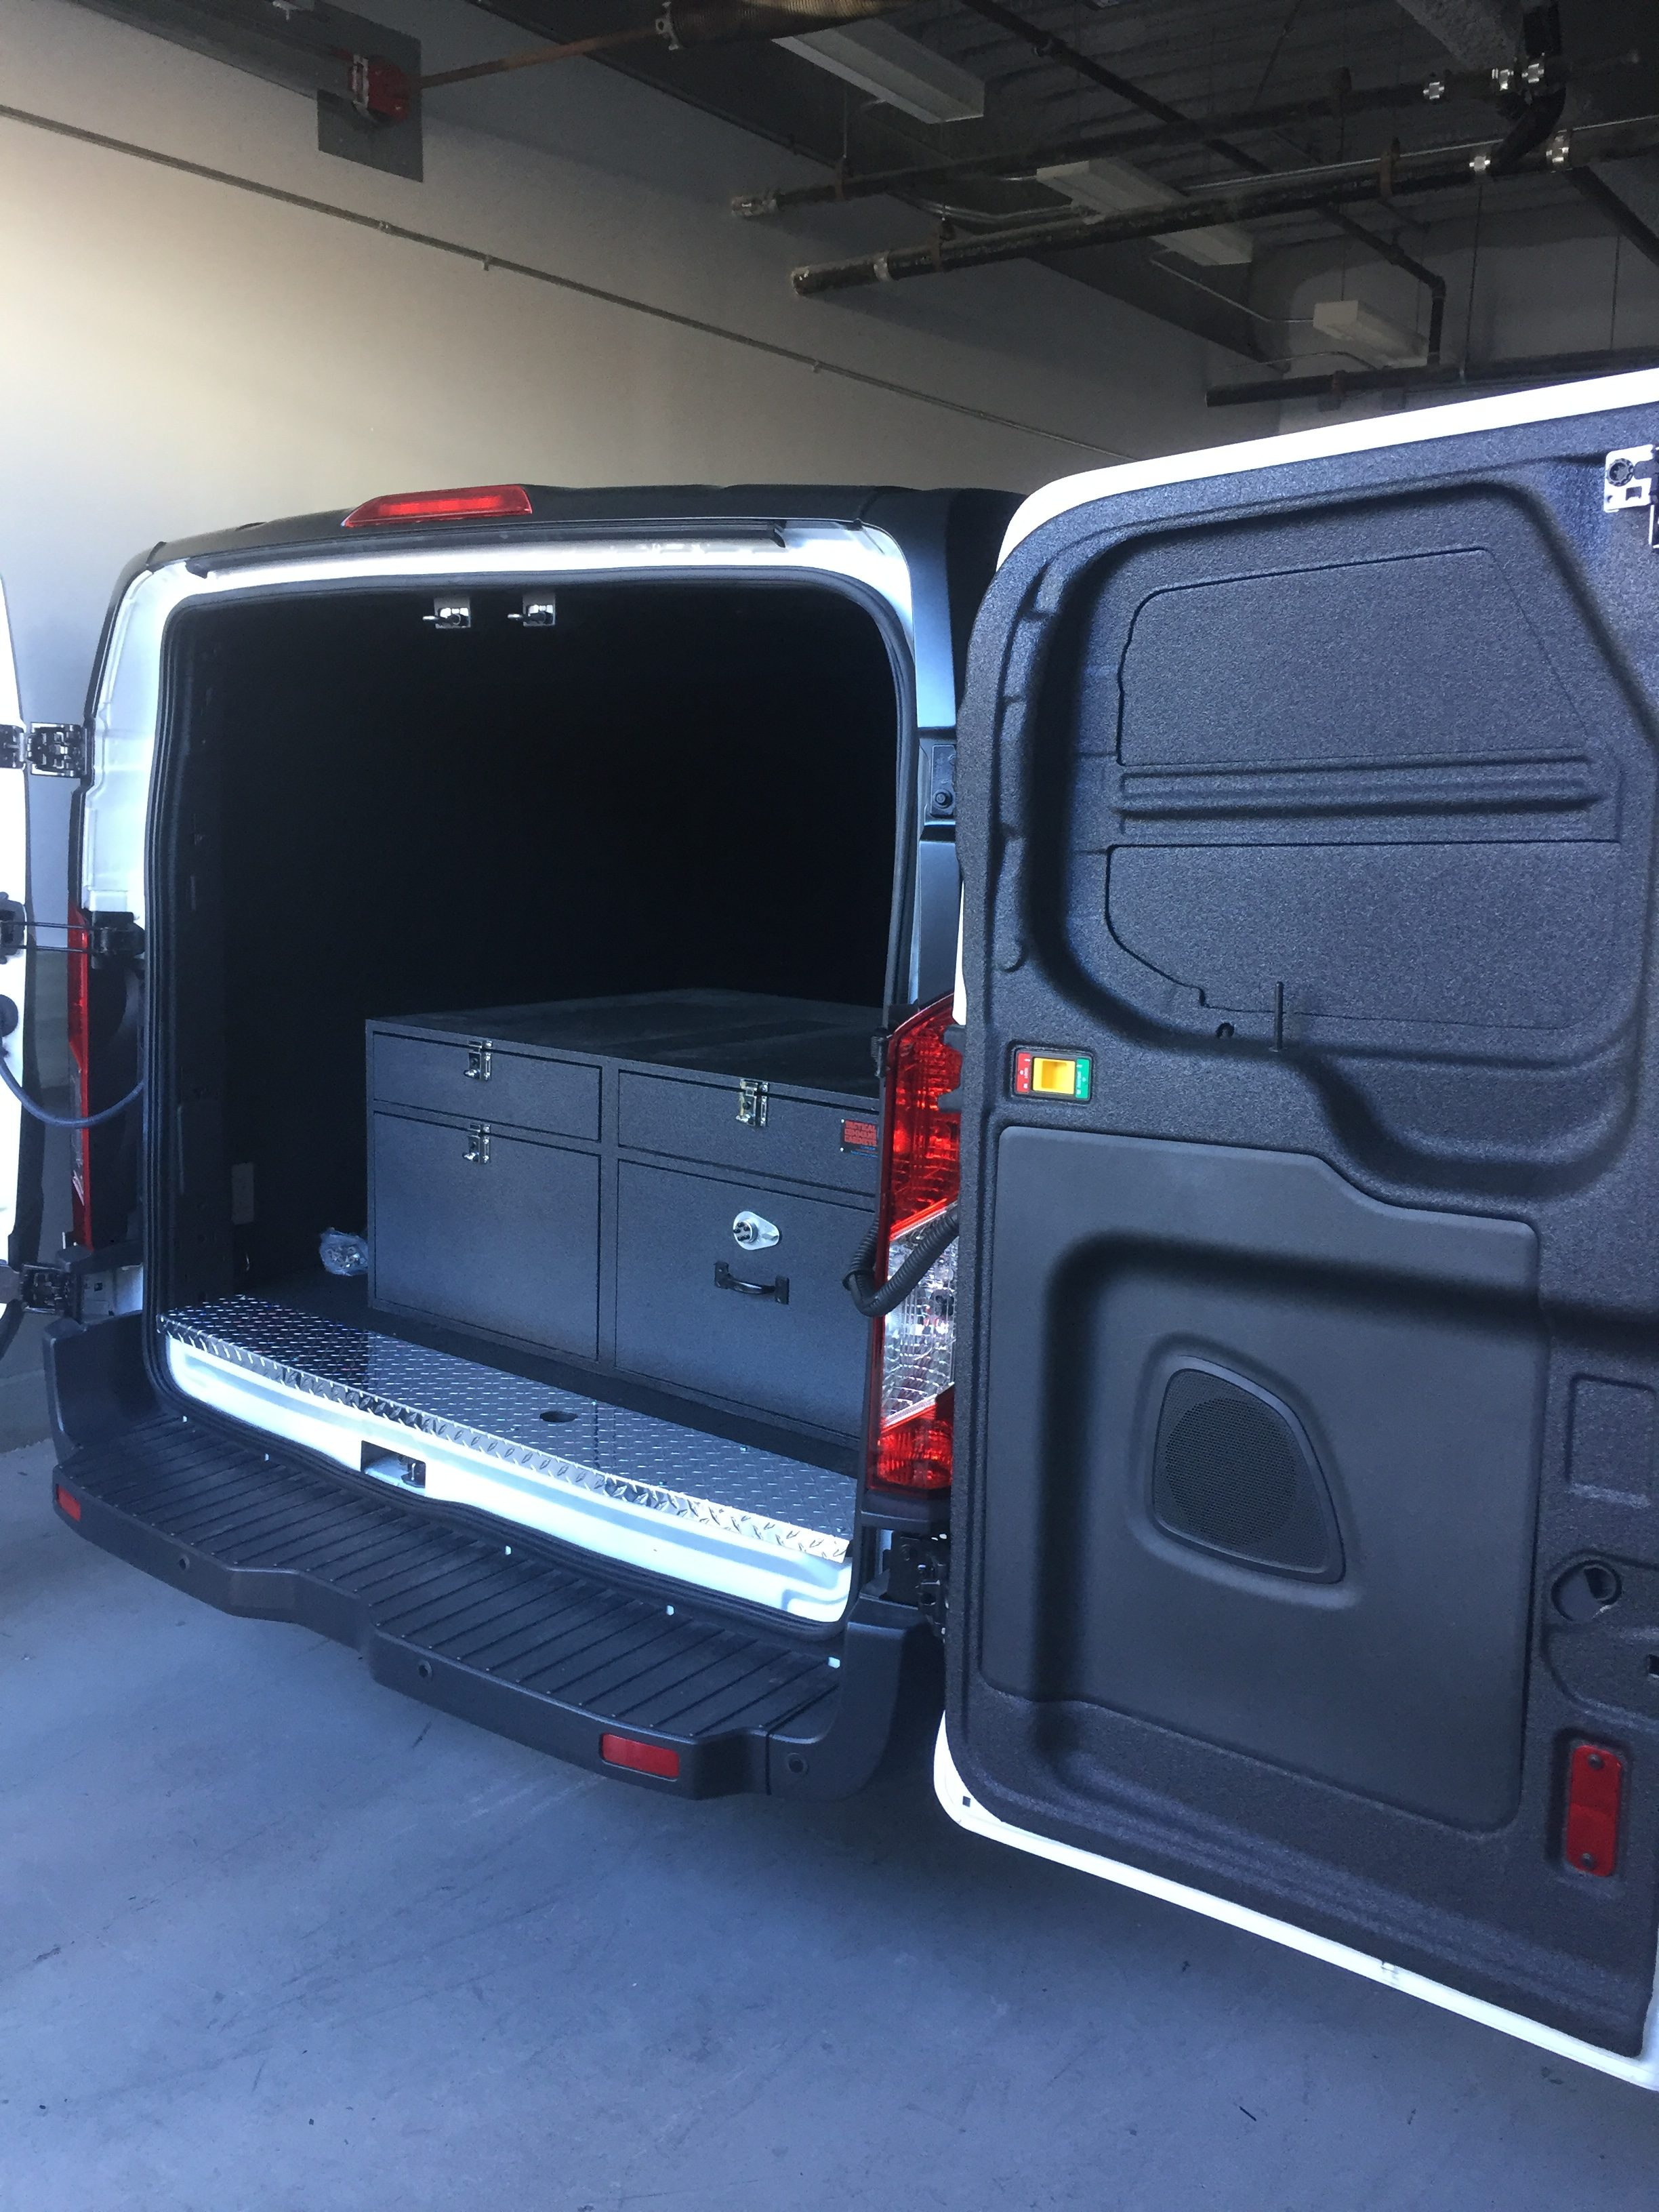 CSI Vehicle interior